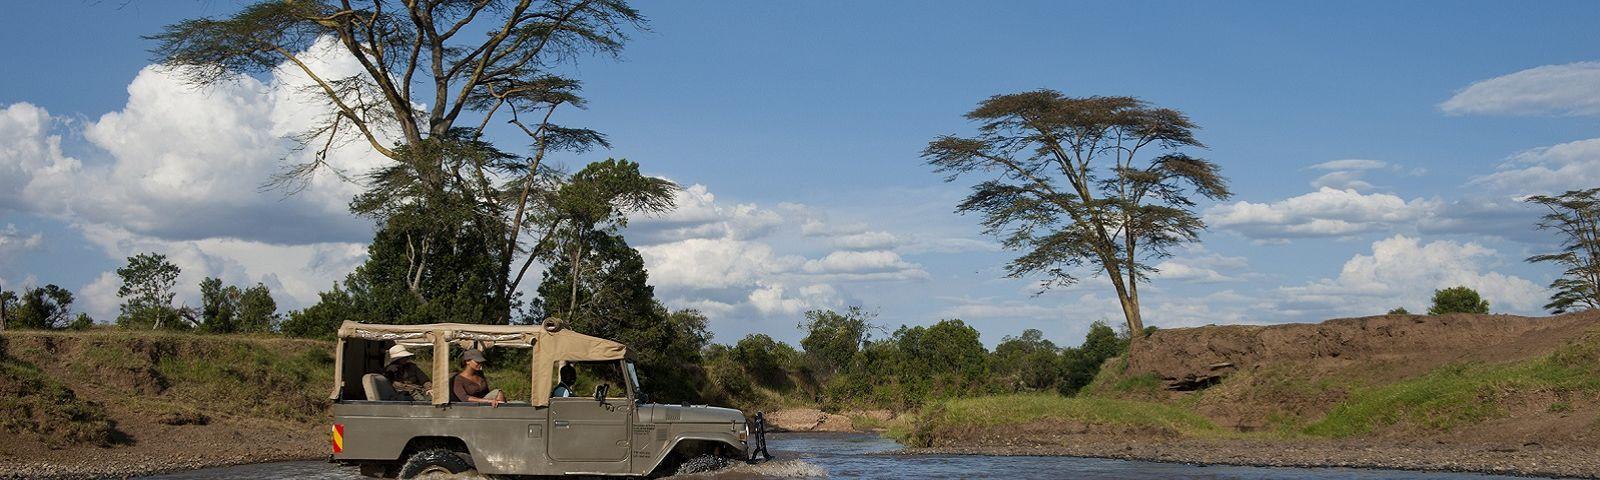 Safari tour in Laikipia - Ol Pejeta / Solio, Kenya